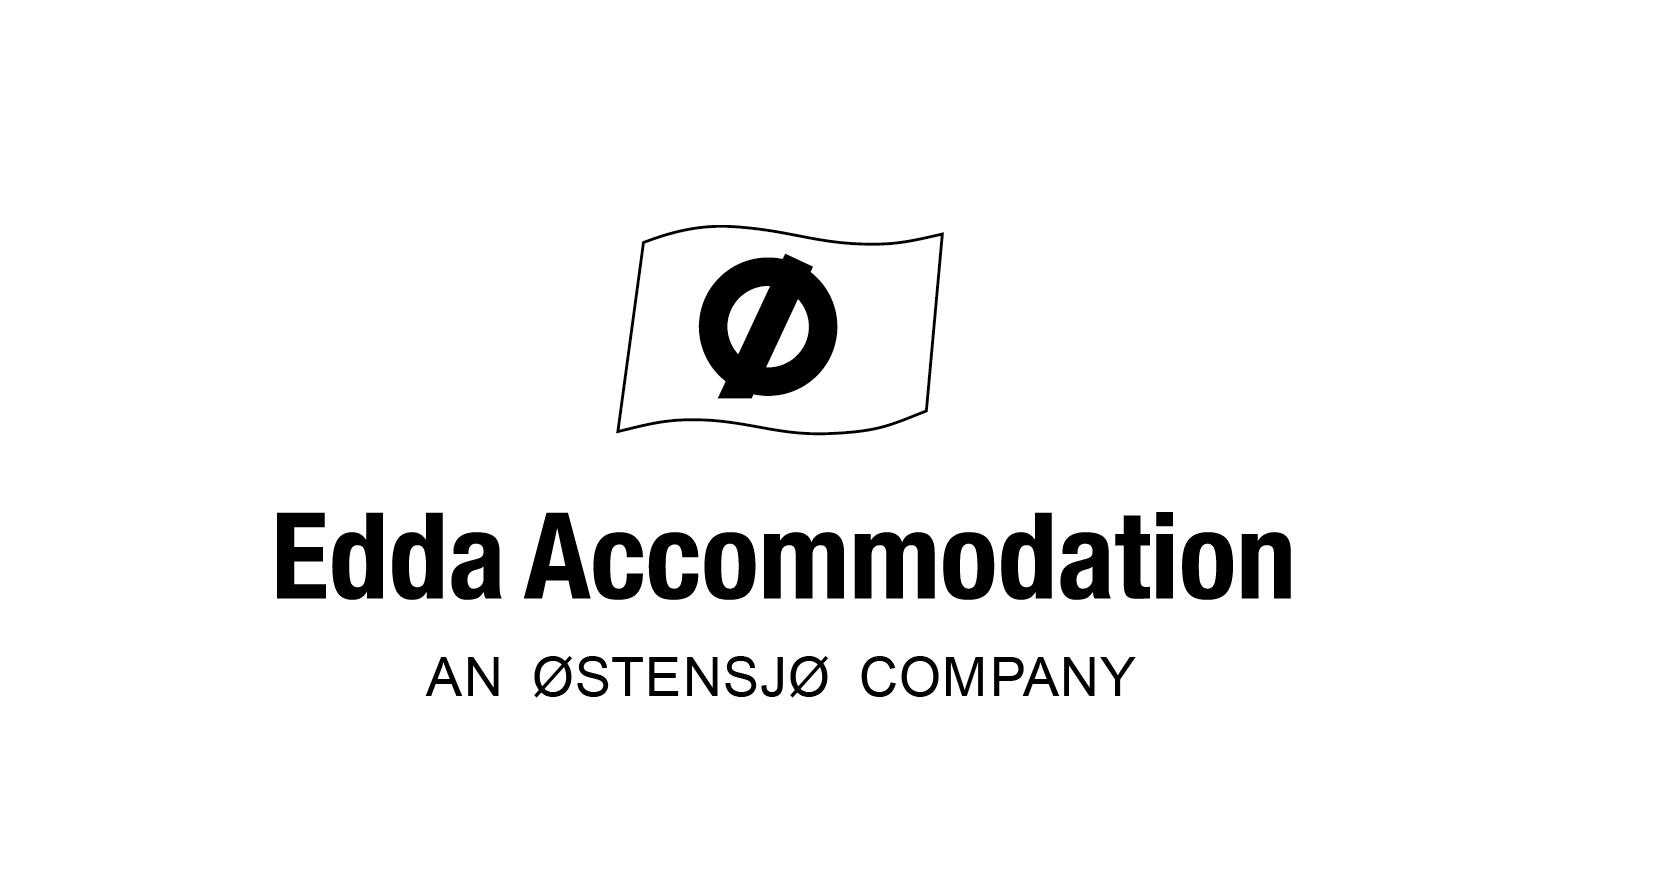 edda accommodation orders a new accommodation vessel